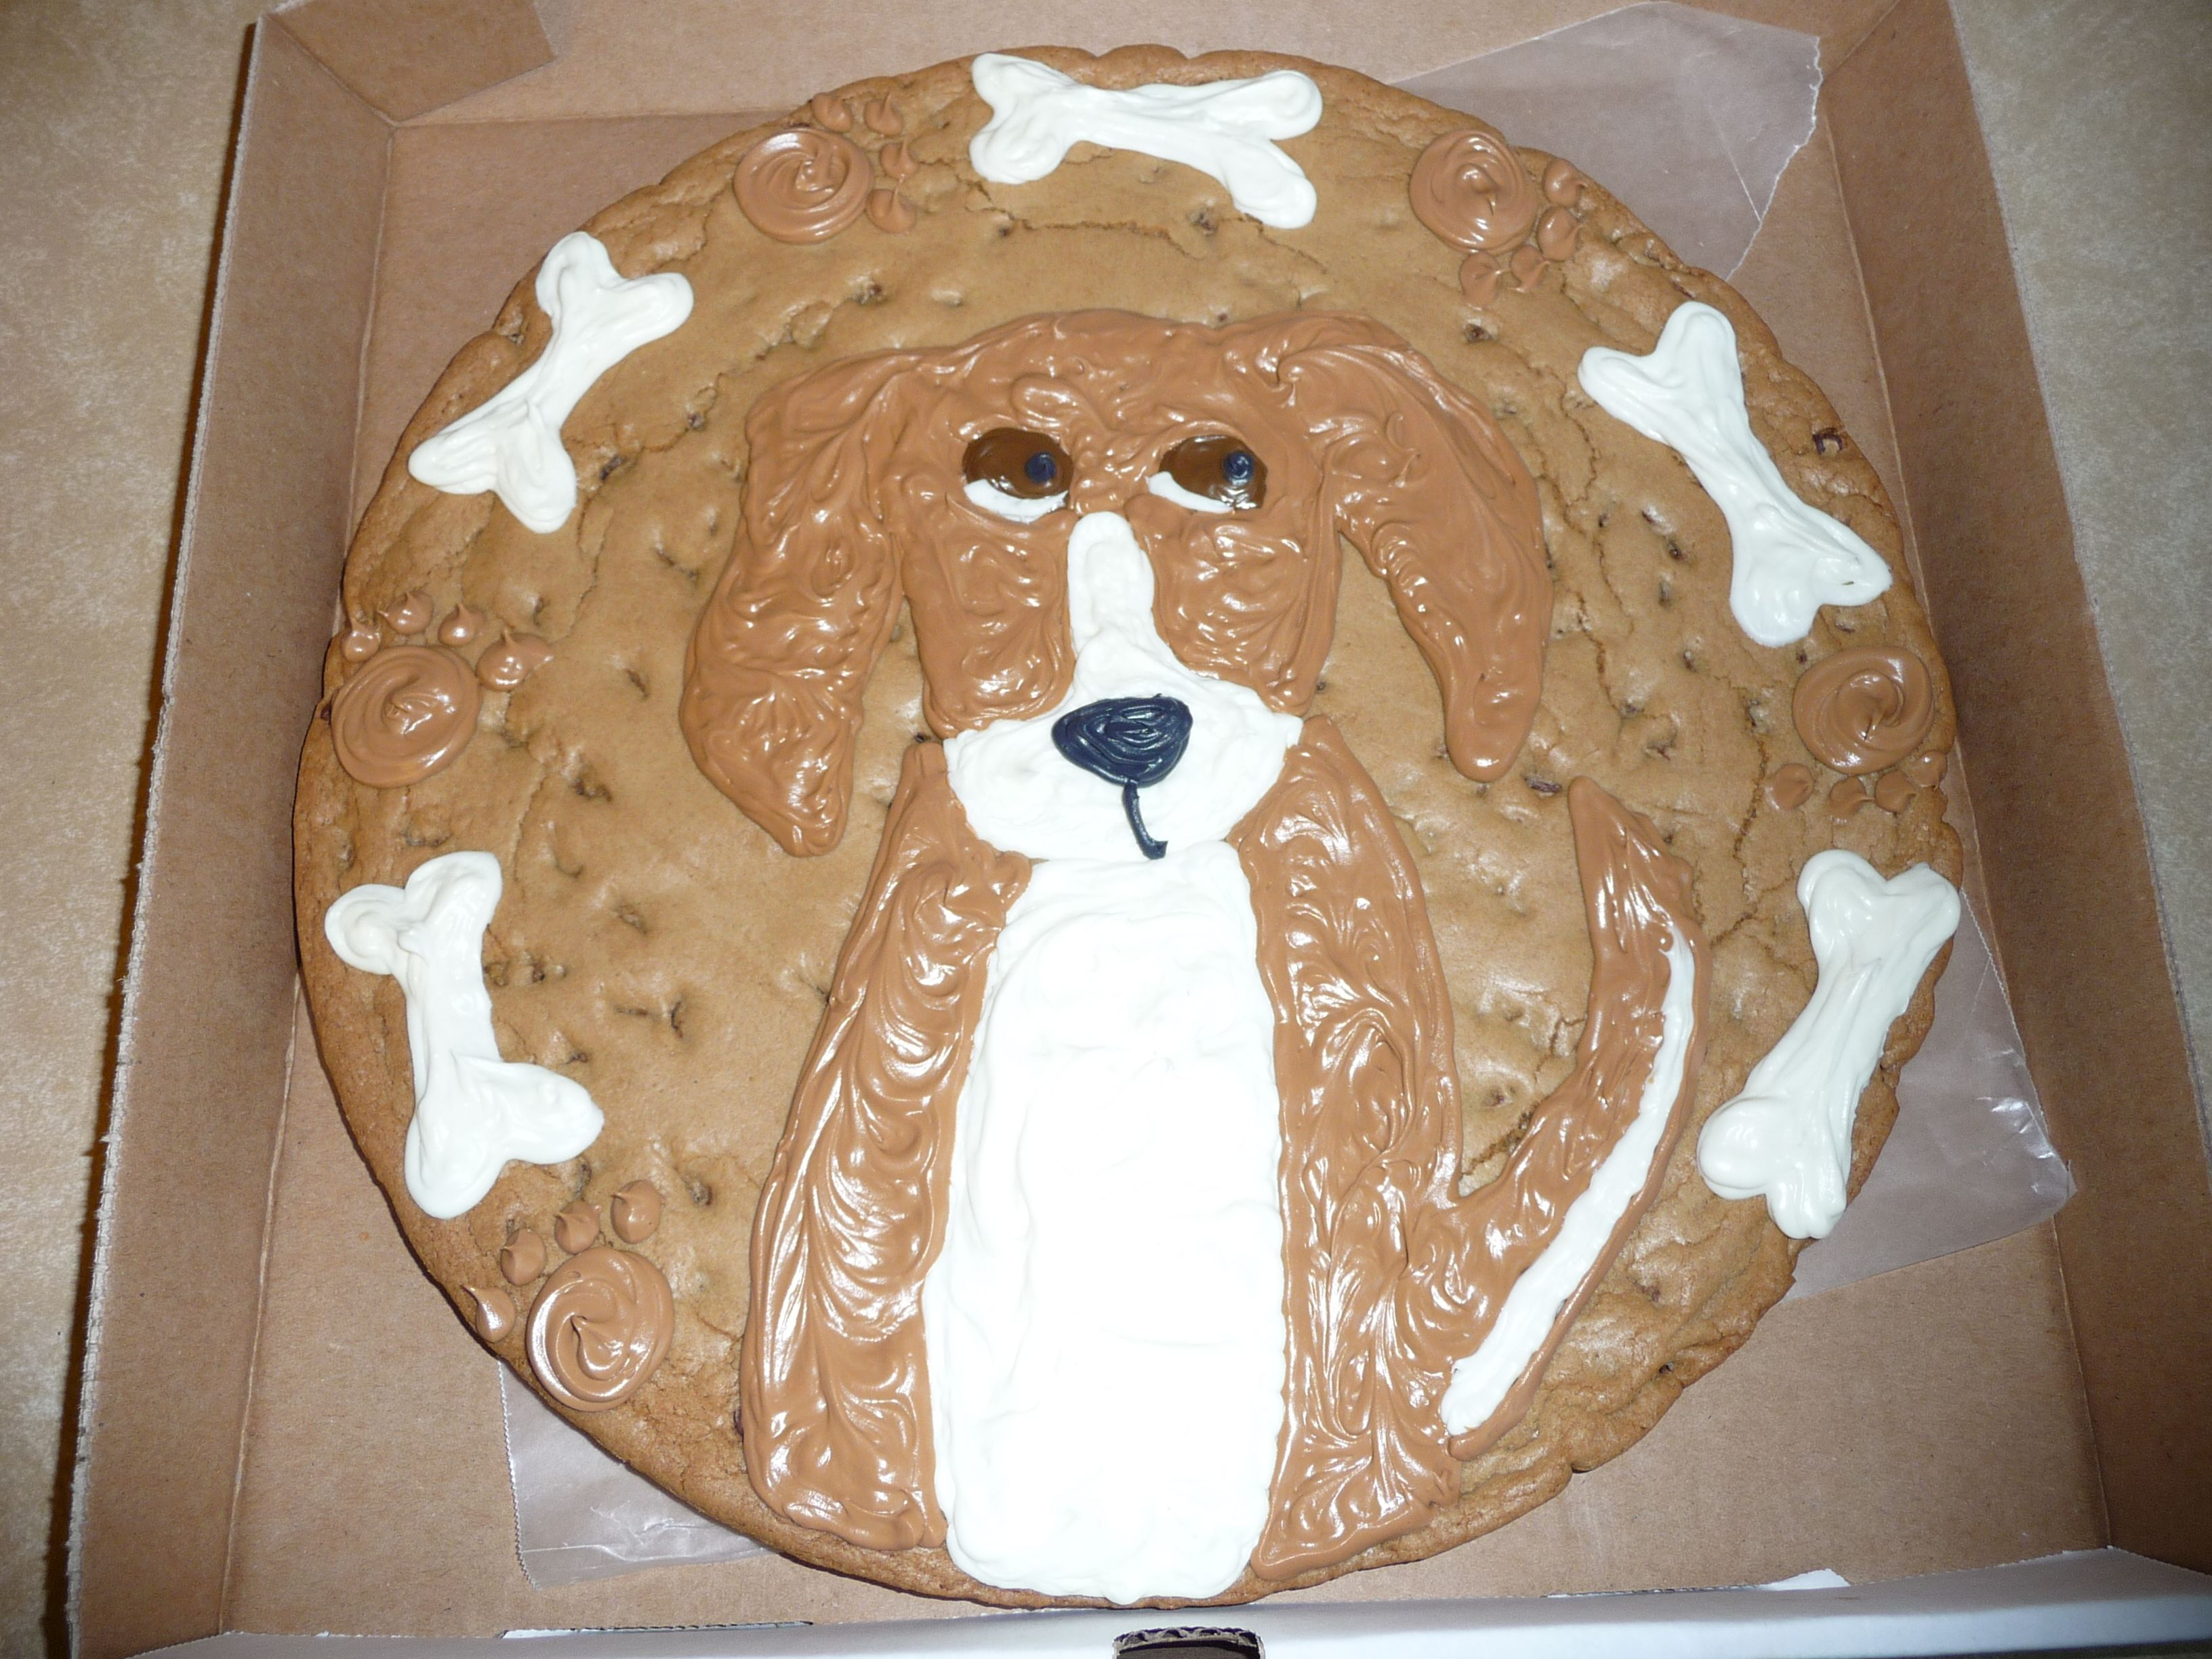 Edible Dog Cake Images : Pin Beagle Puppy Kitten Cat Dog Edible Birthday Party Cake ...